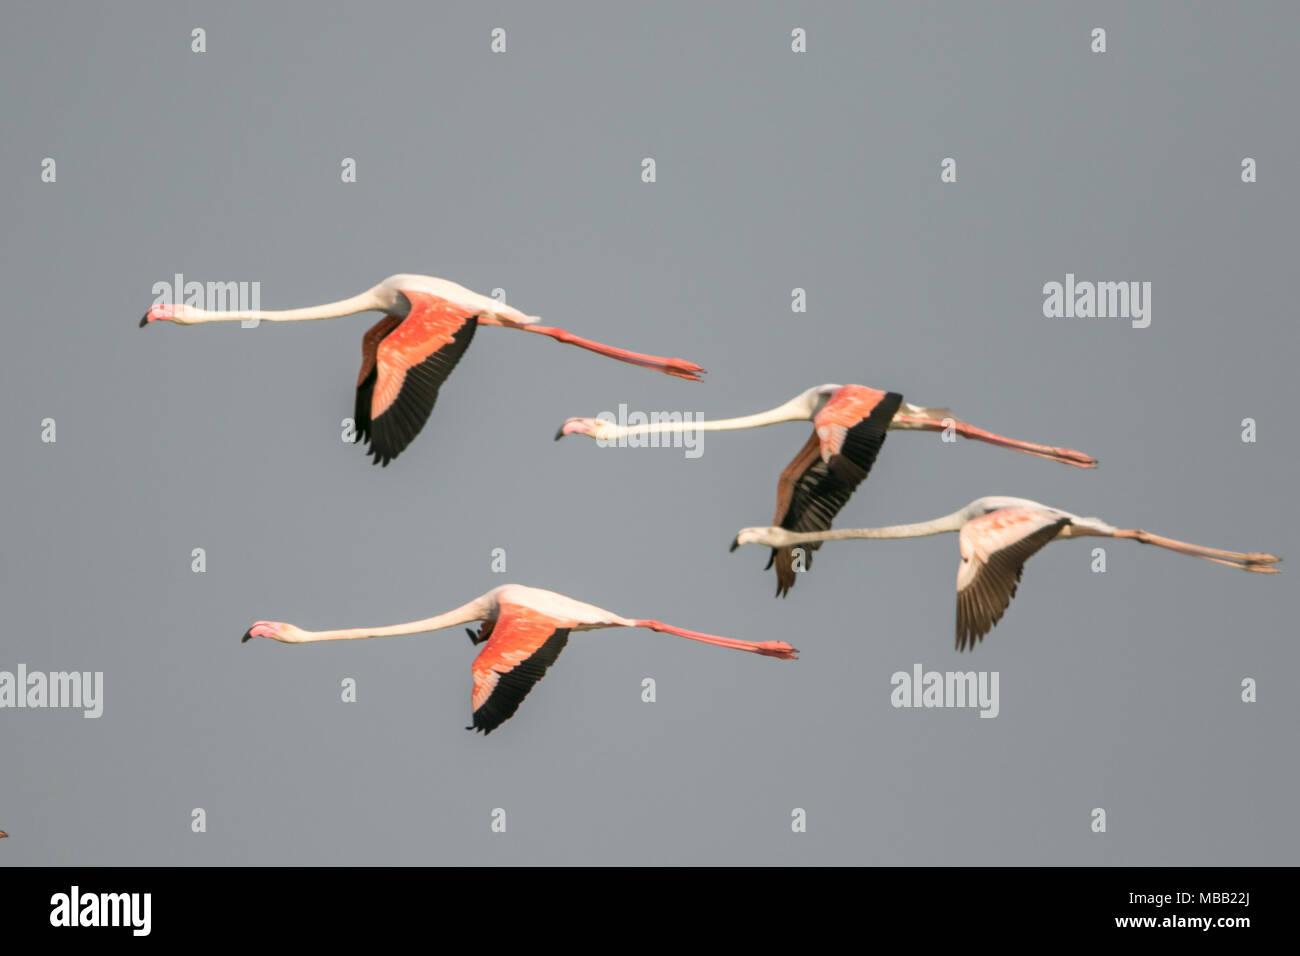 The greater flamingo (Phoenicopterus roseus) found around Pune at Bhigwan Bird Sanctuary, Maharashtra, India. Stock Photo